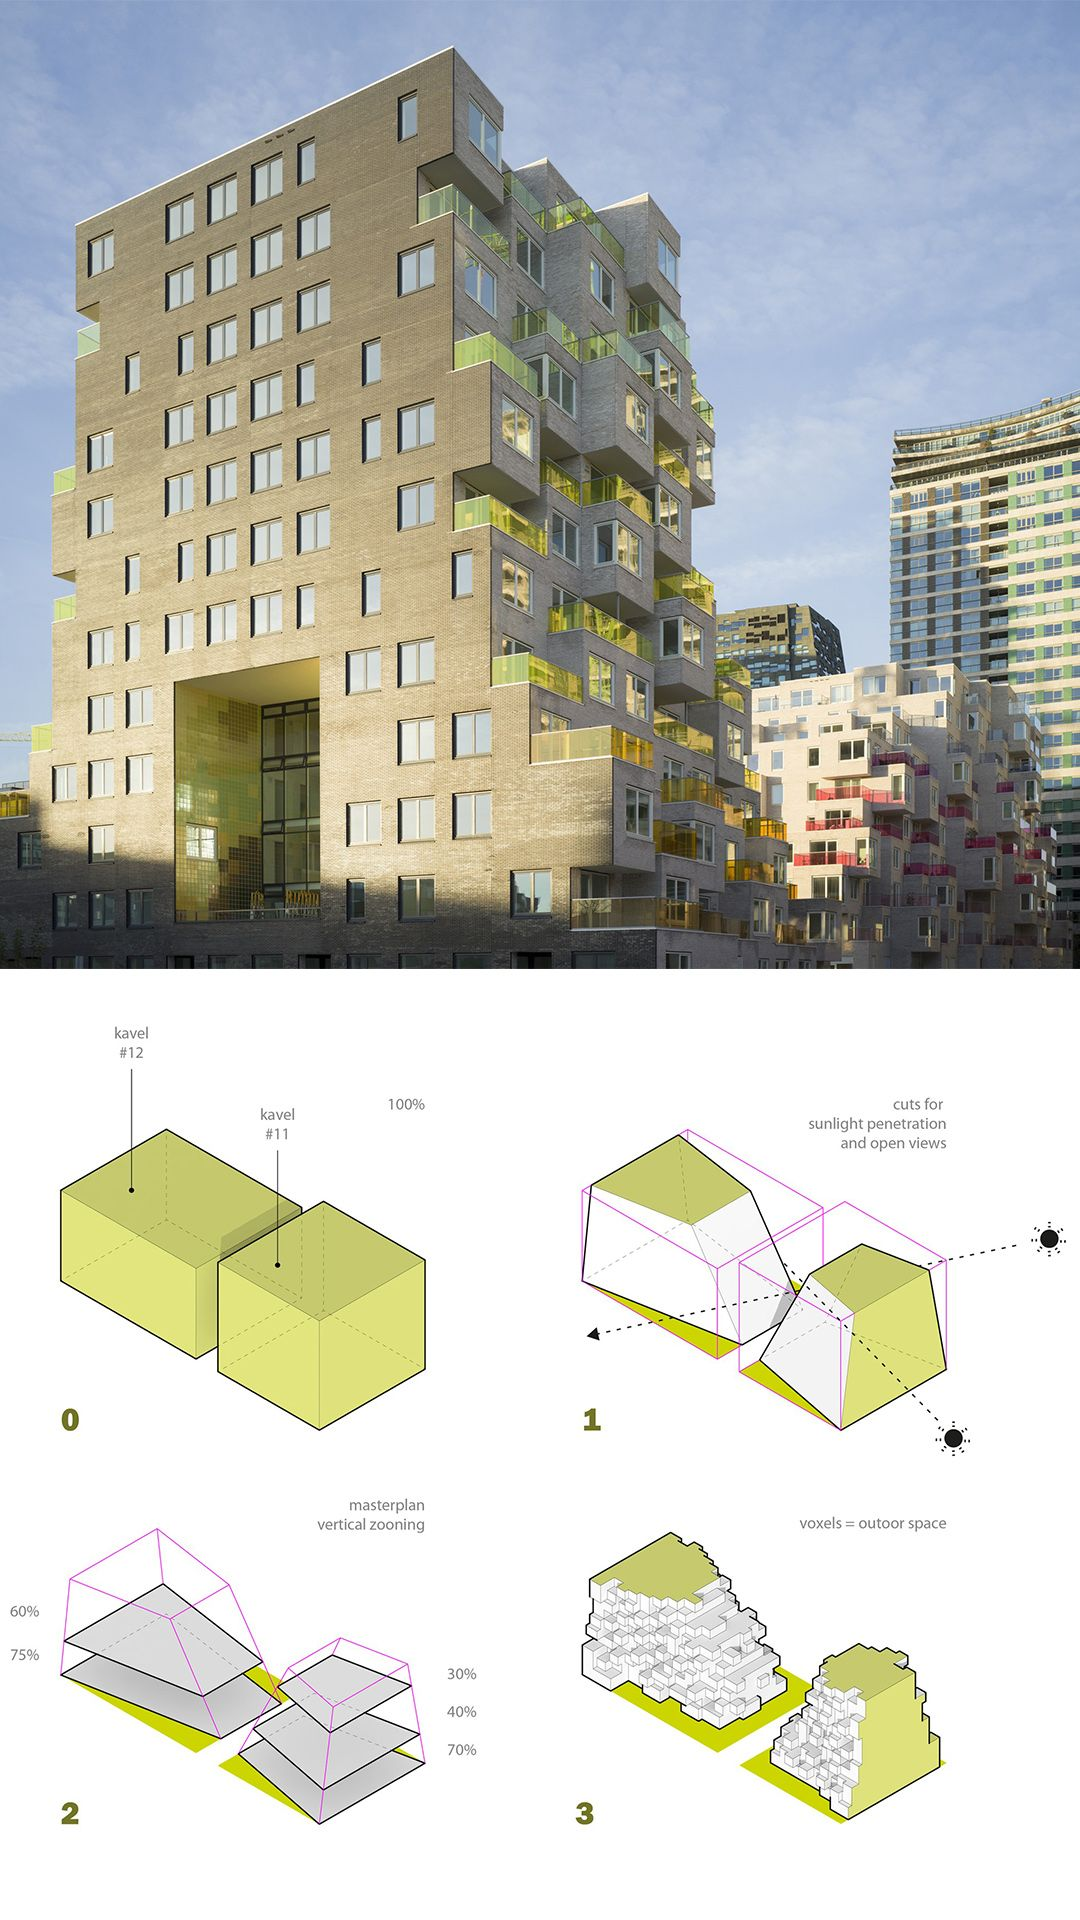 hight resolution of summertime housing art itecture pinterest architecture 3d building structure diagrams 3d building diagram